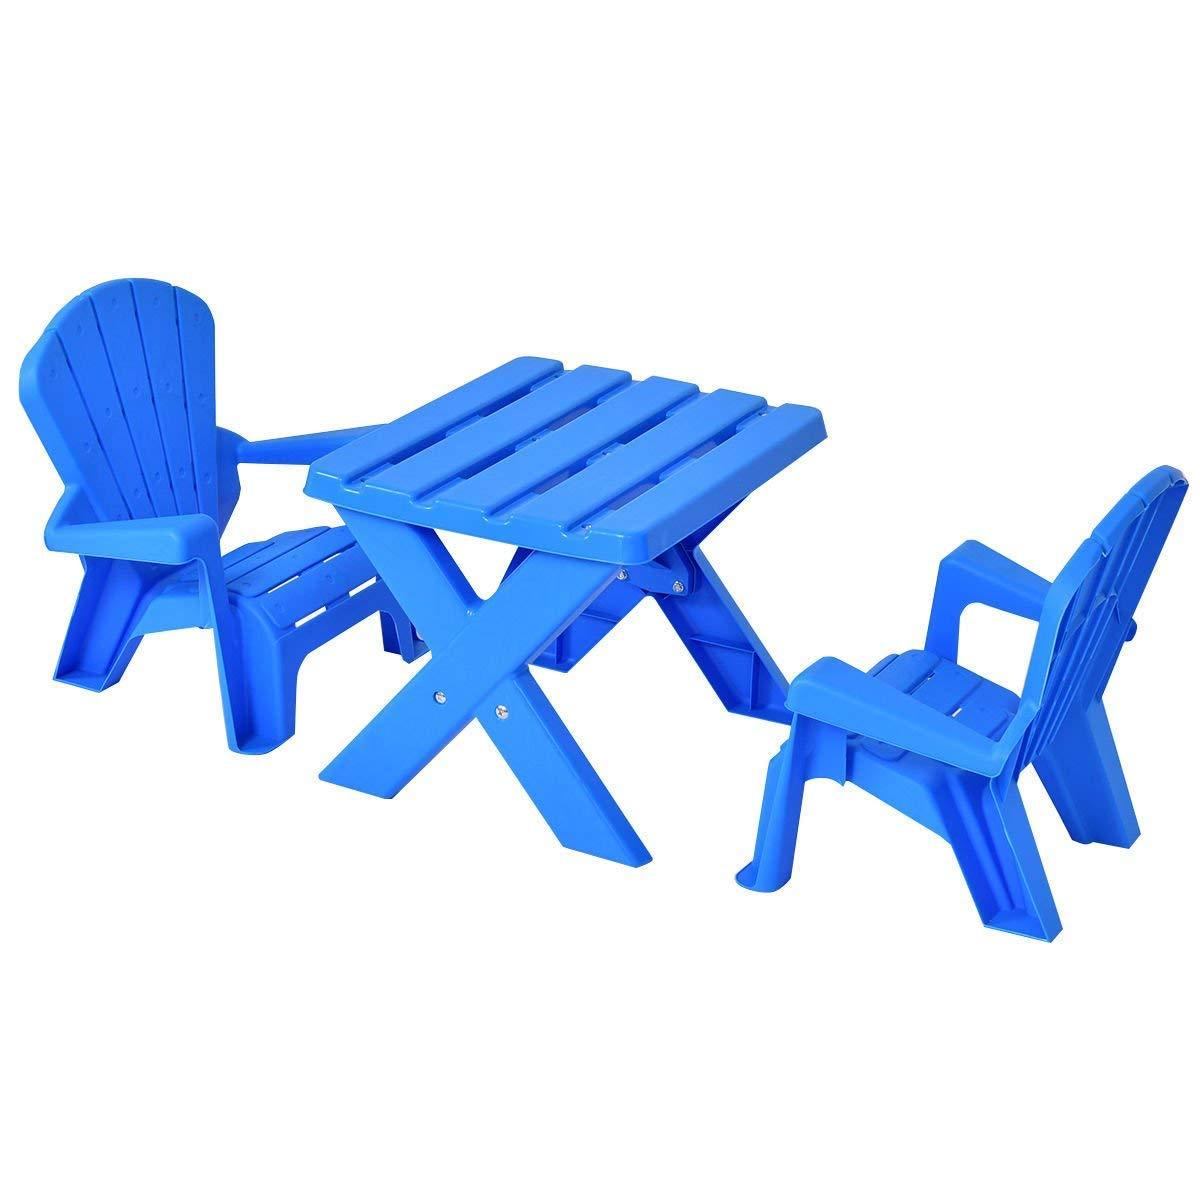 HONEY JOY Kids Plastic Table and 2 Chairs Set, Adirondack Chair, Patio Activity Craft Table Set (Blue) by HONEY JOY